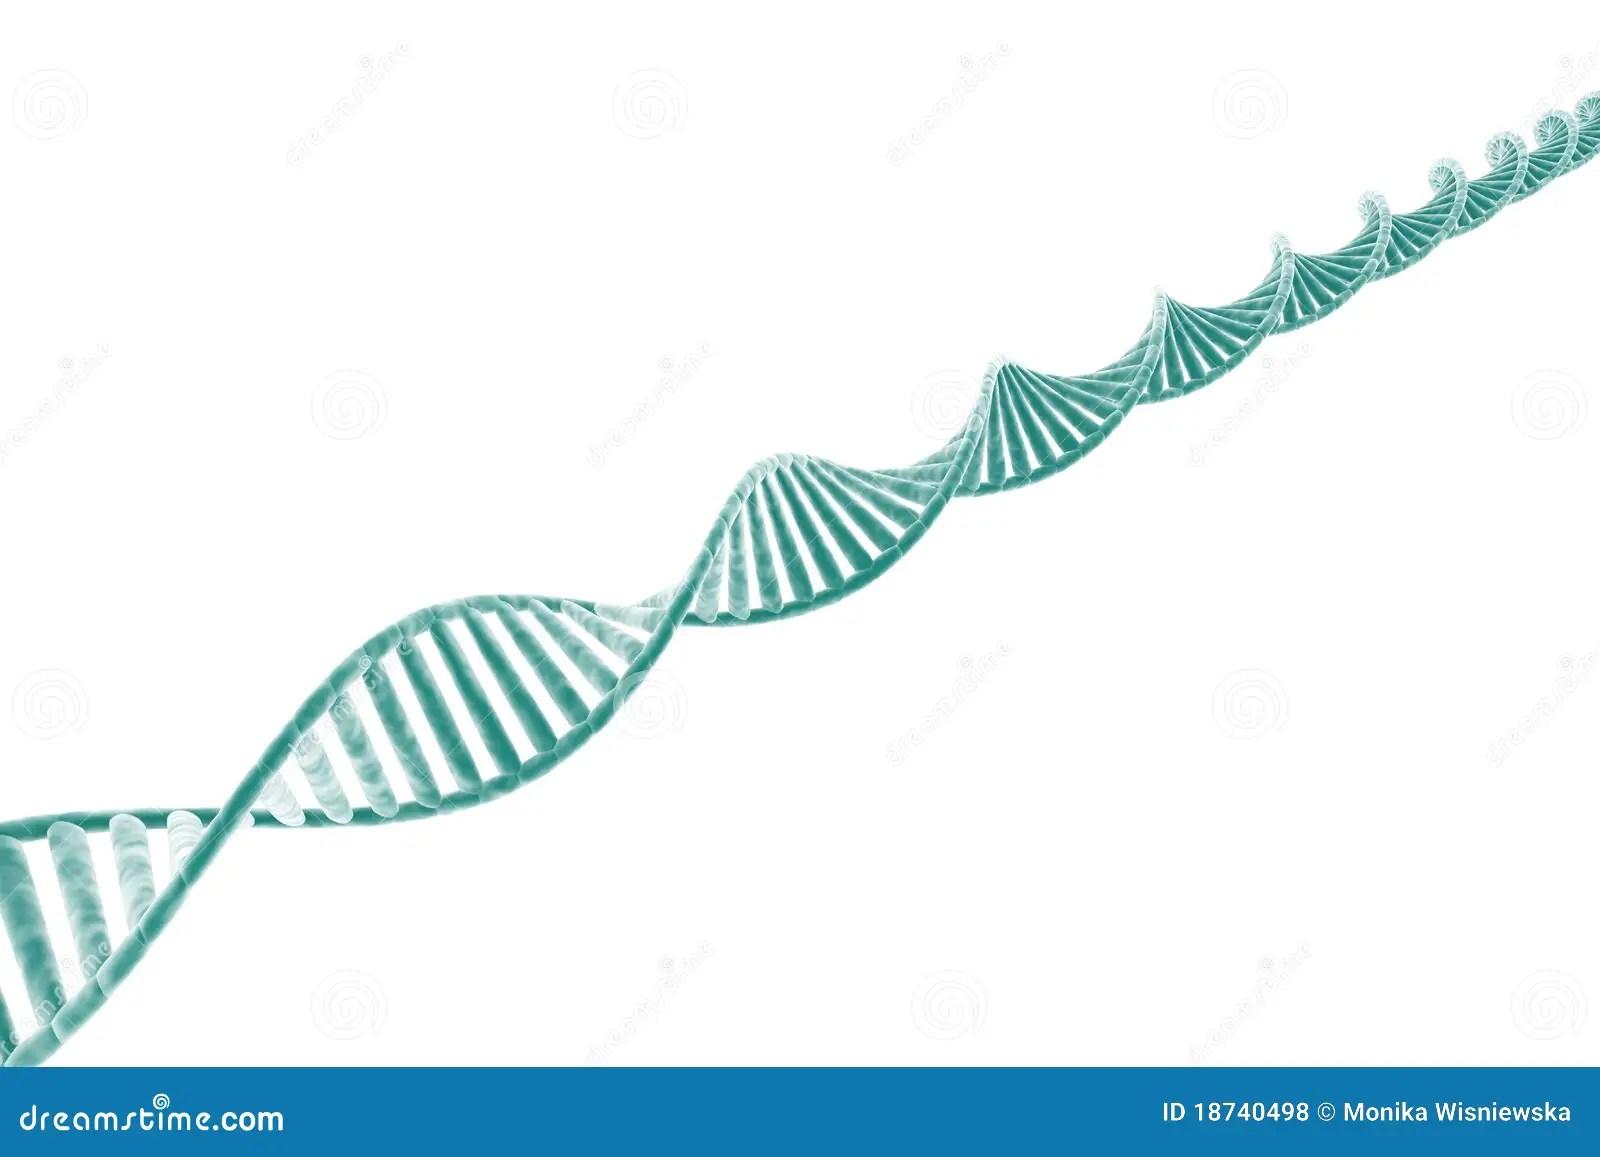 DNA Strand Royalty Free Stock Photos  Image 18740498